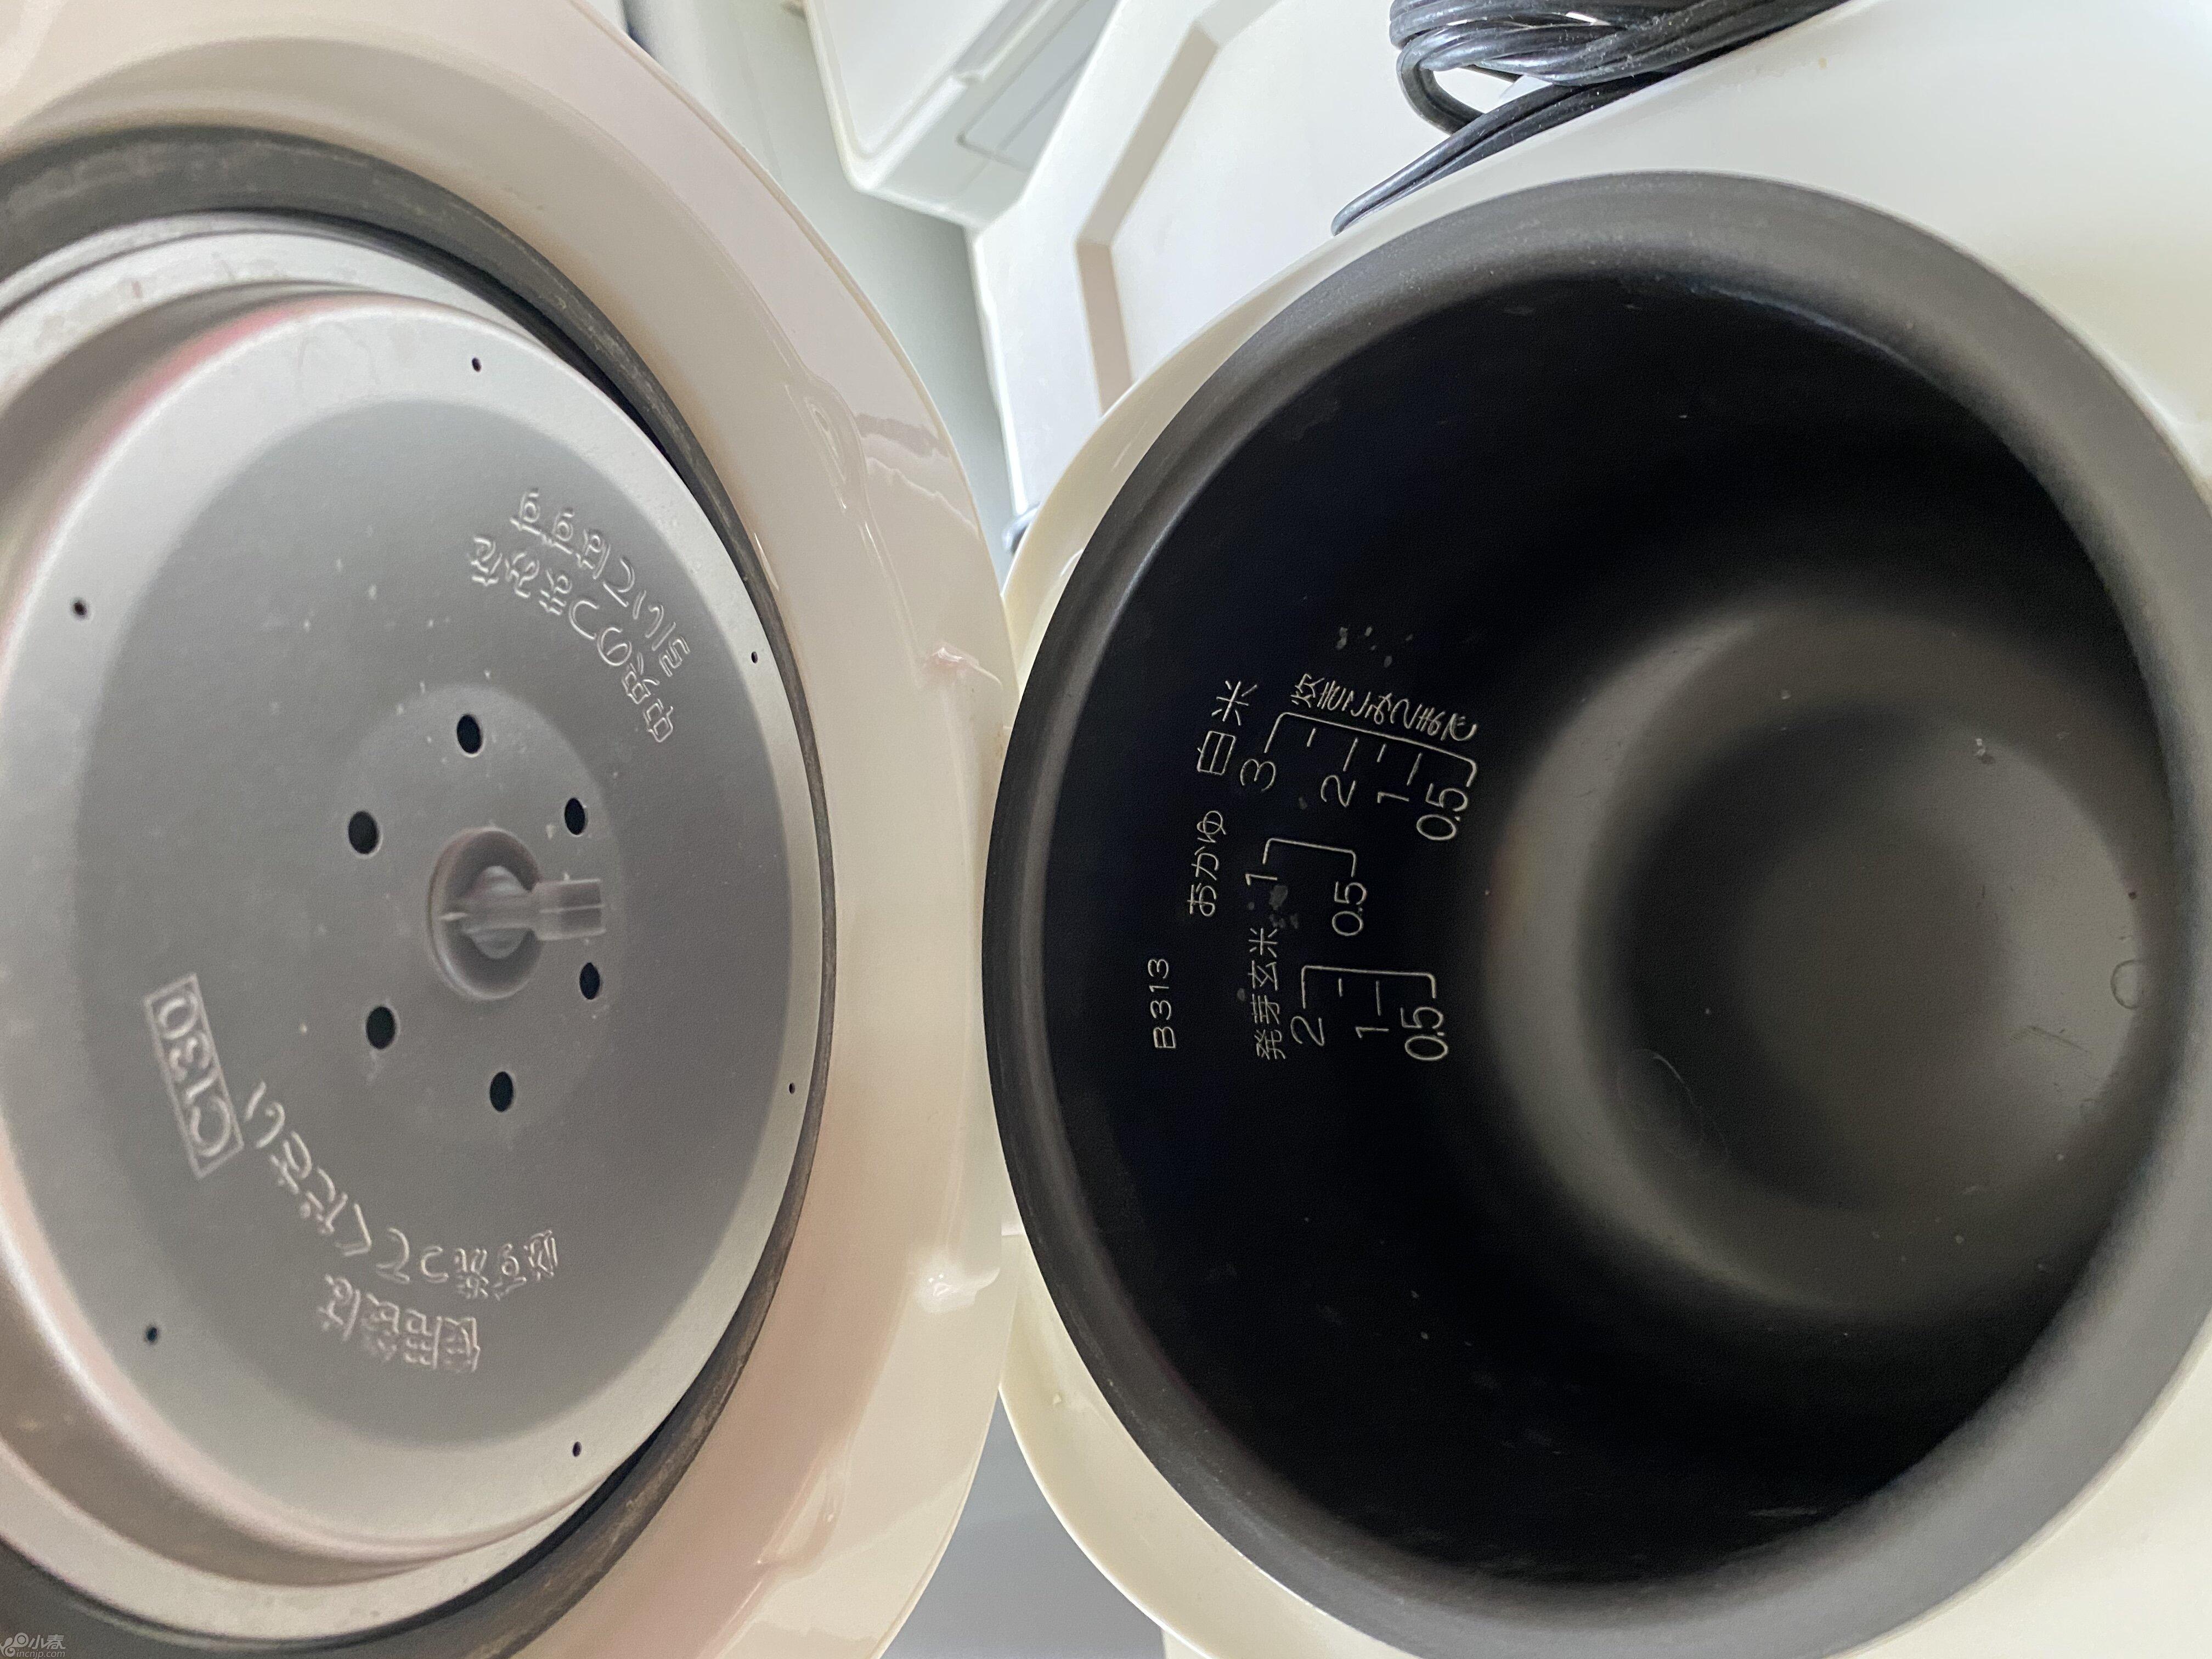 707DF9E0-4D43-459A-B56C-3370E09F4F7D.jpeg